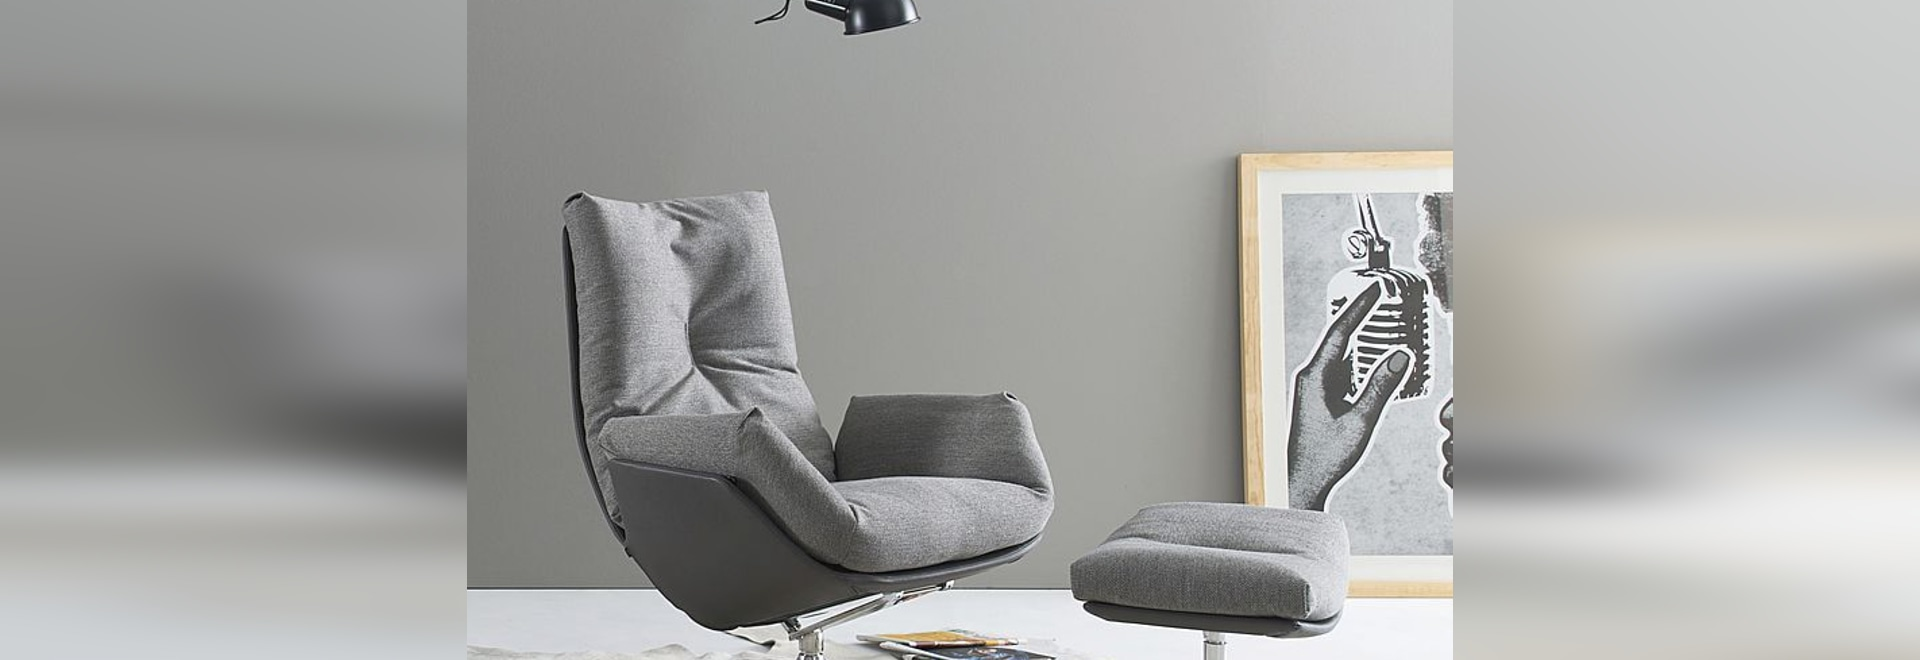 Cor Cordia Lounge Sessel Preis